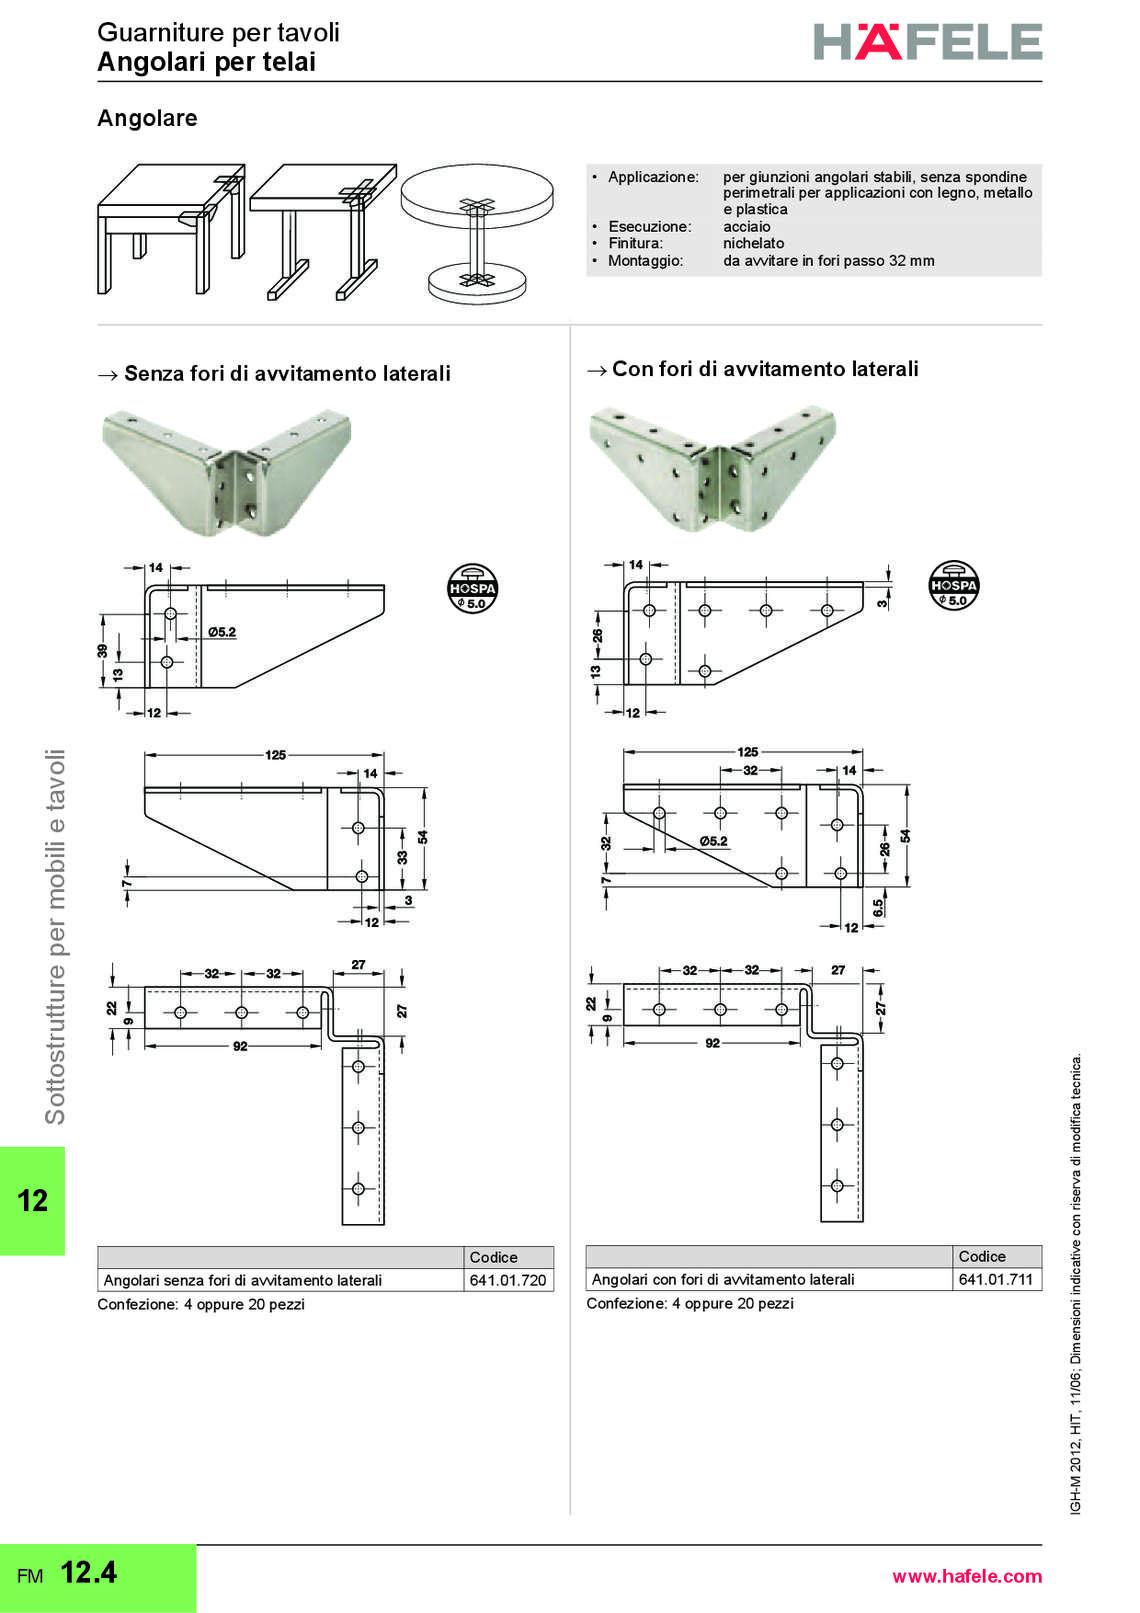 hafele-sottostrutture-per-mobili_83_013.jpg